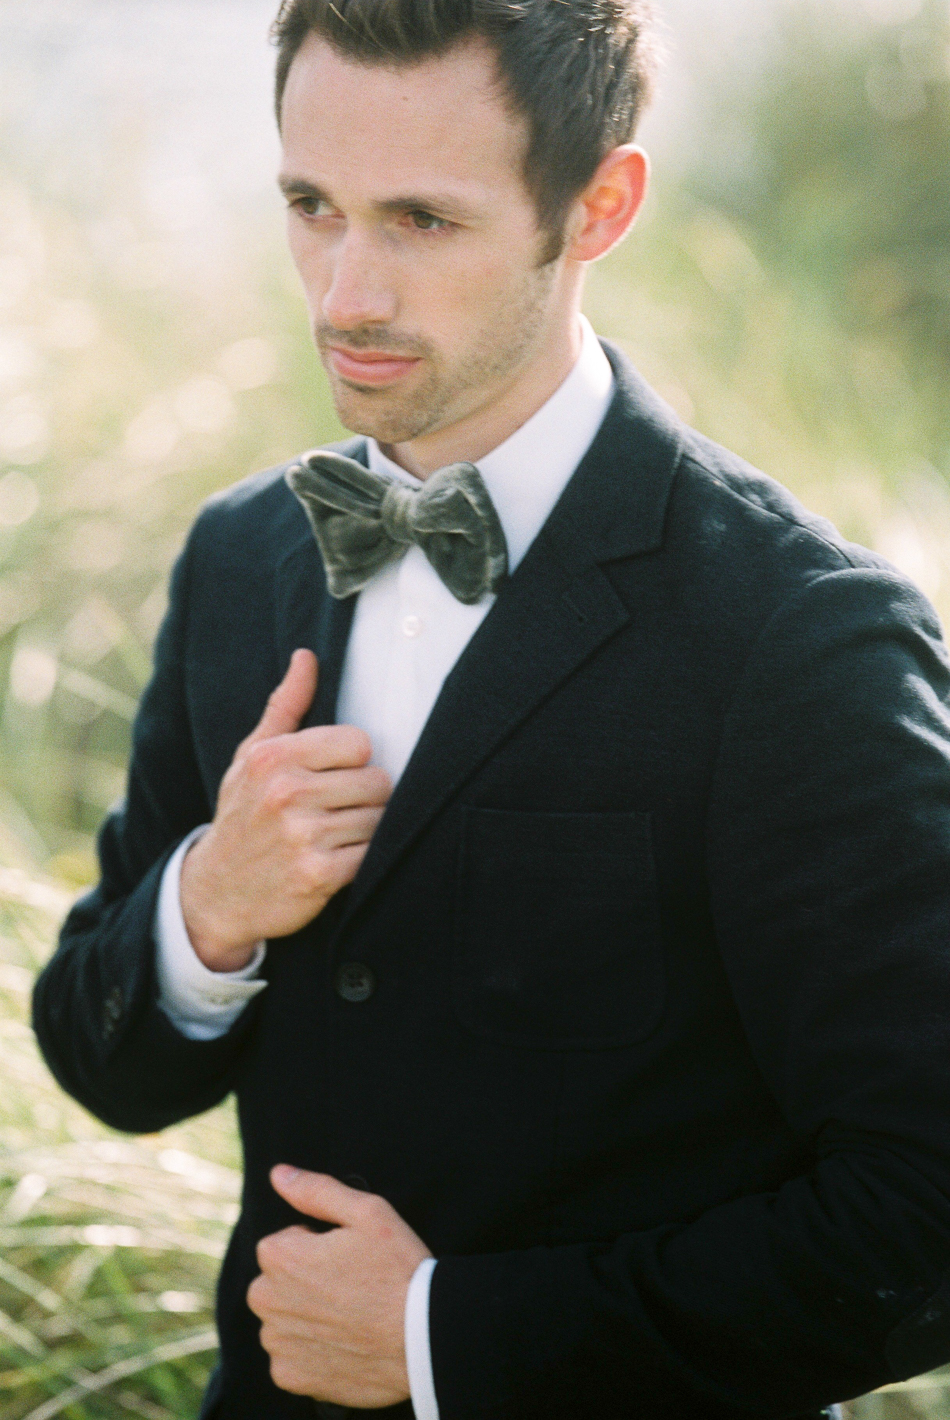 Chen-Sands-Film-Photography-Portraits-Engagement-Elopment-Ireland-10.jpg